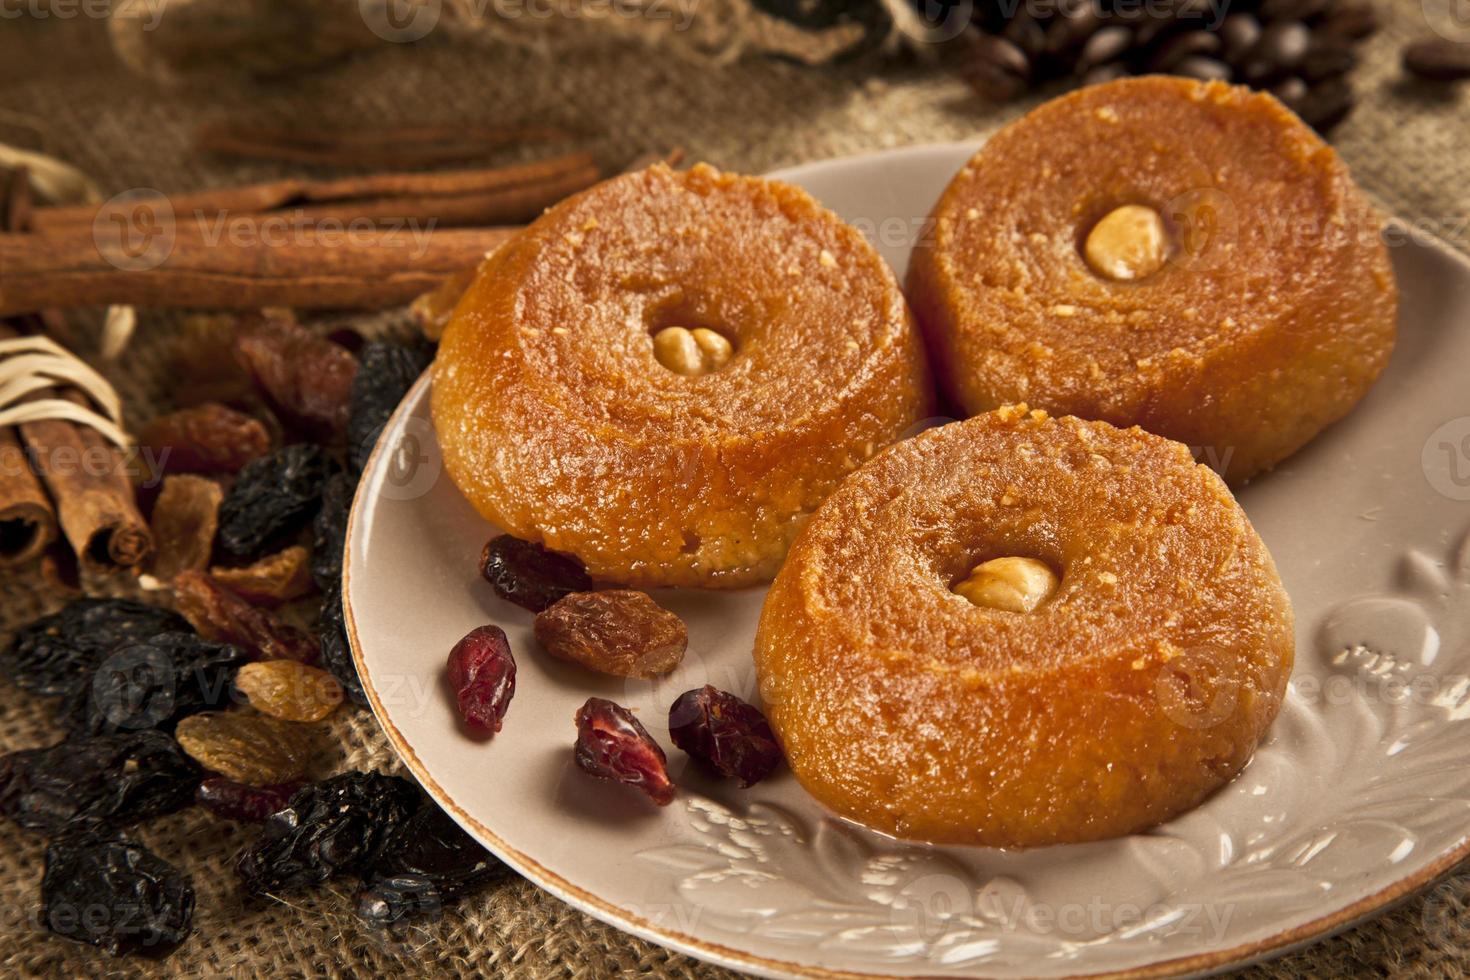 turkisk ramadan sweet - sekerpare med träbakgrund foto